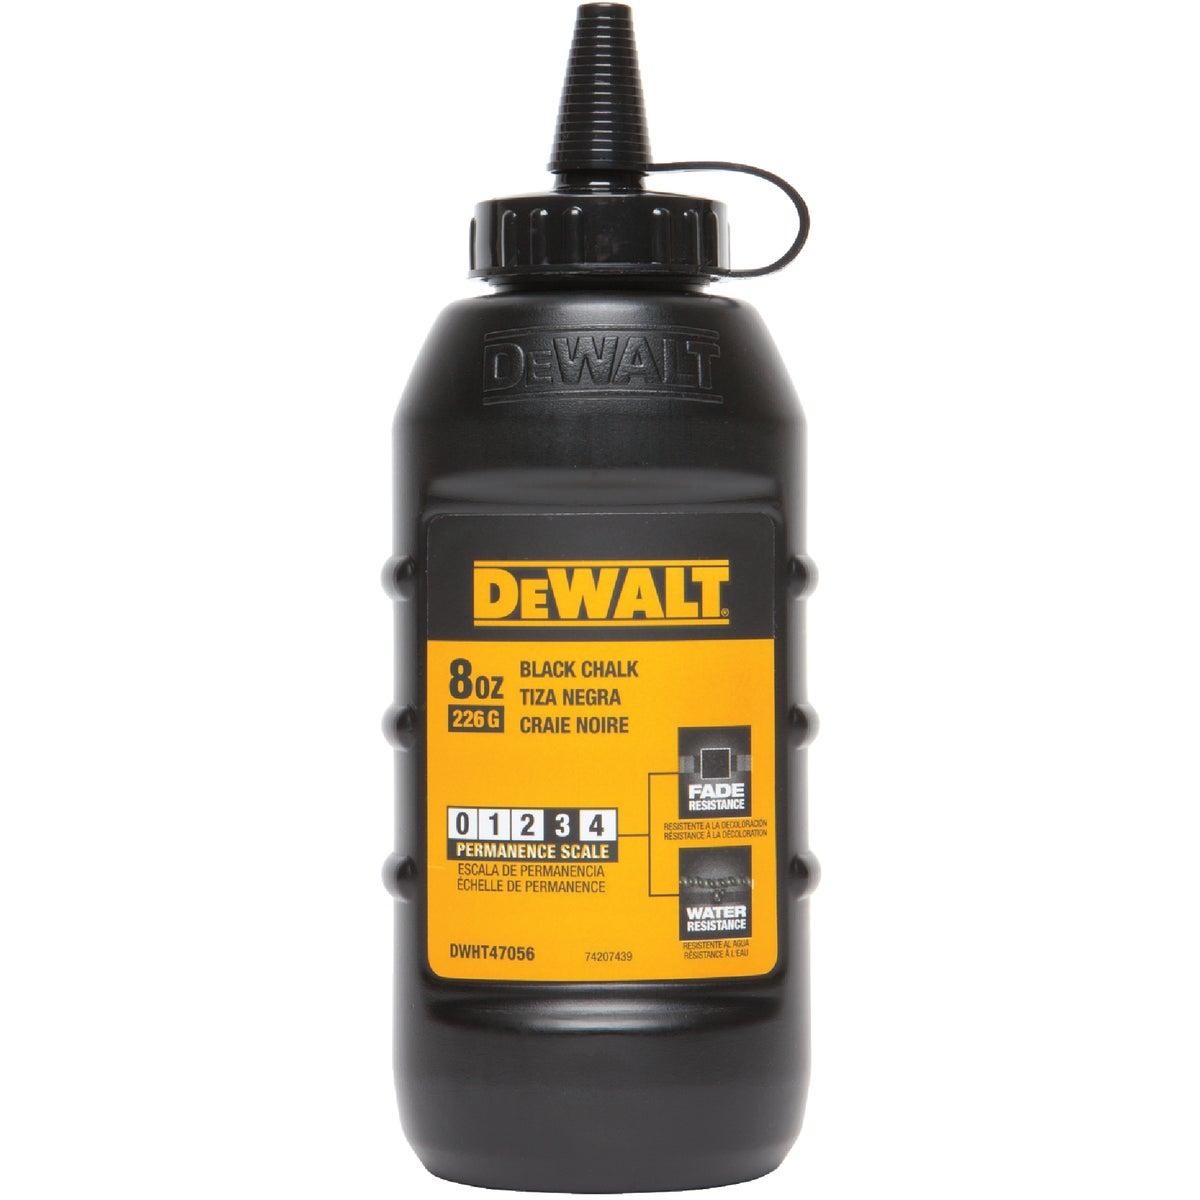 DeWalt 8 Oz. Black Chalk Line Chalk